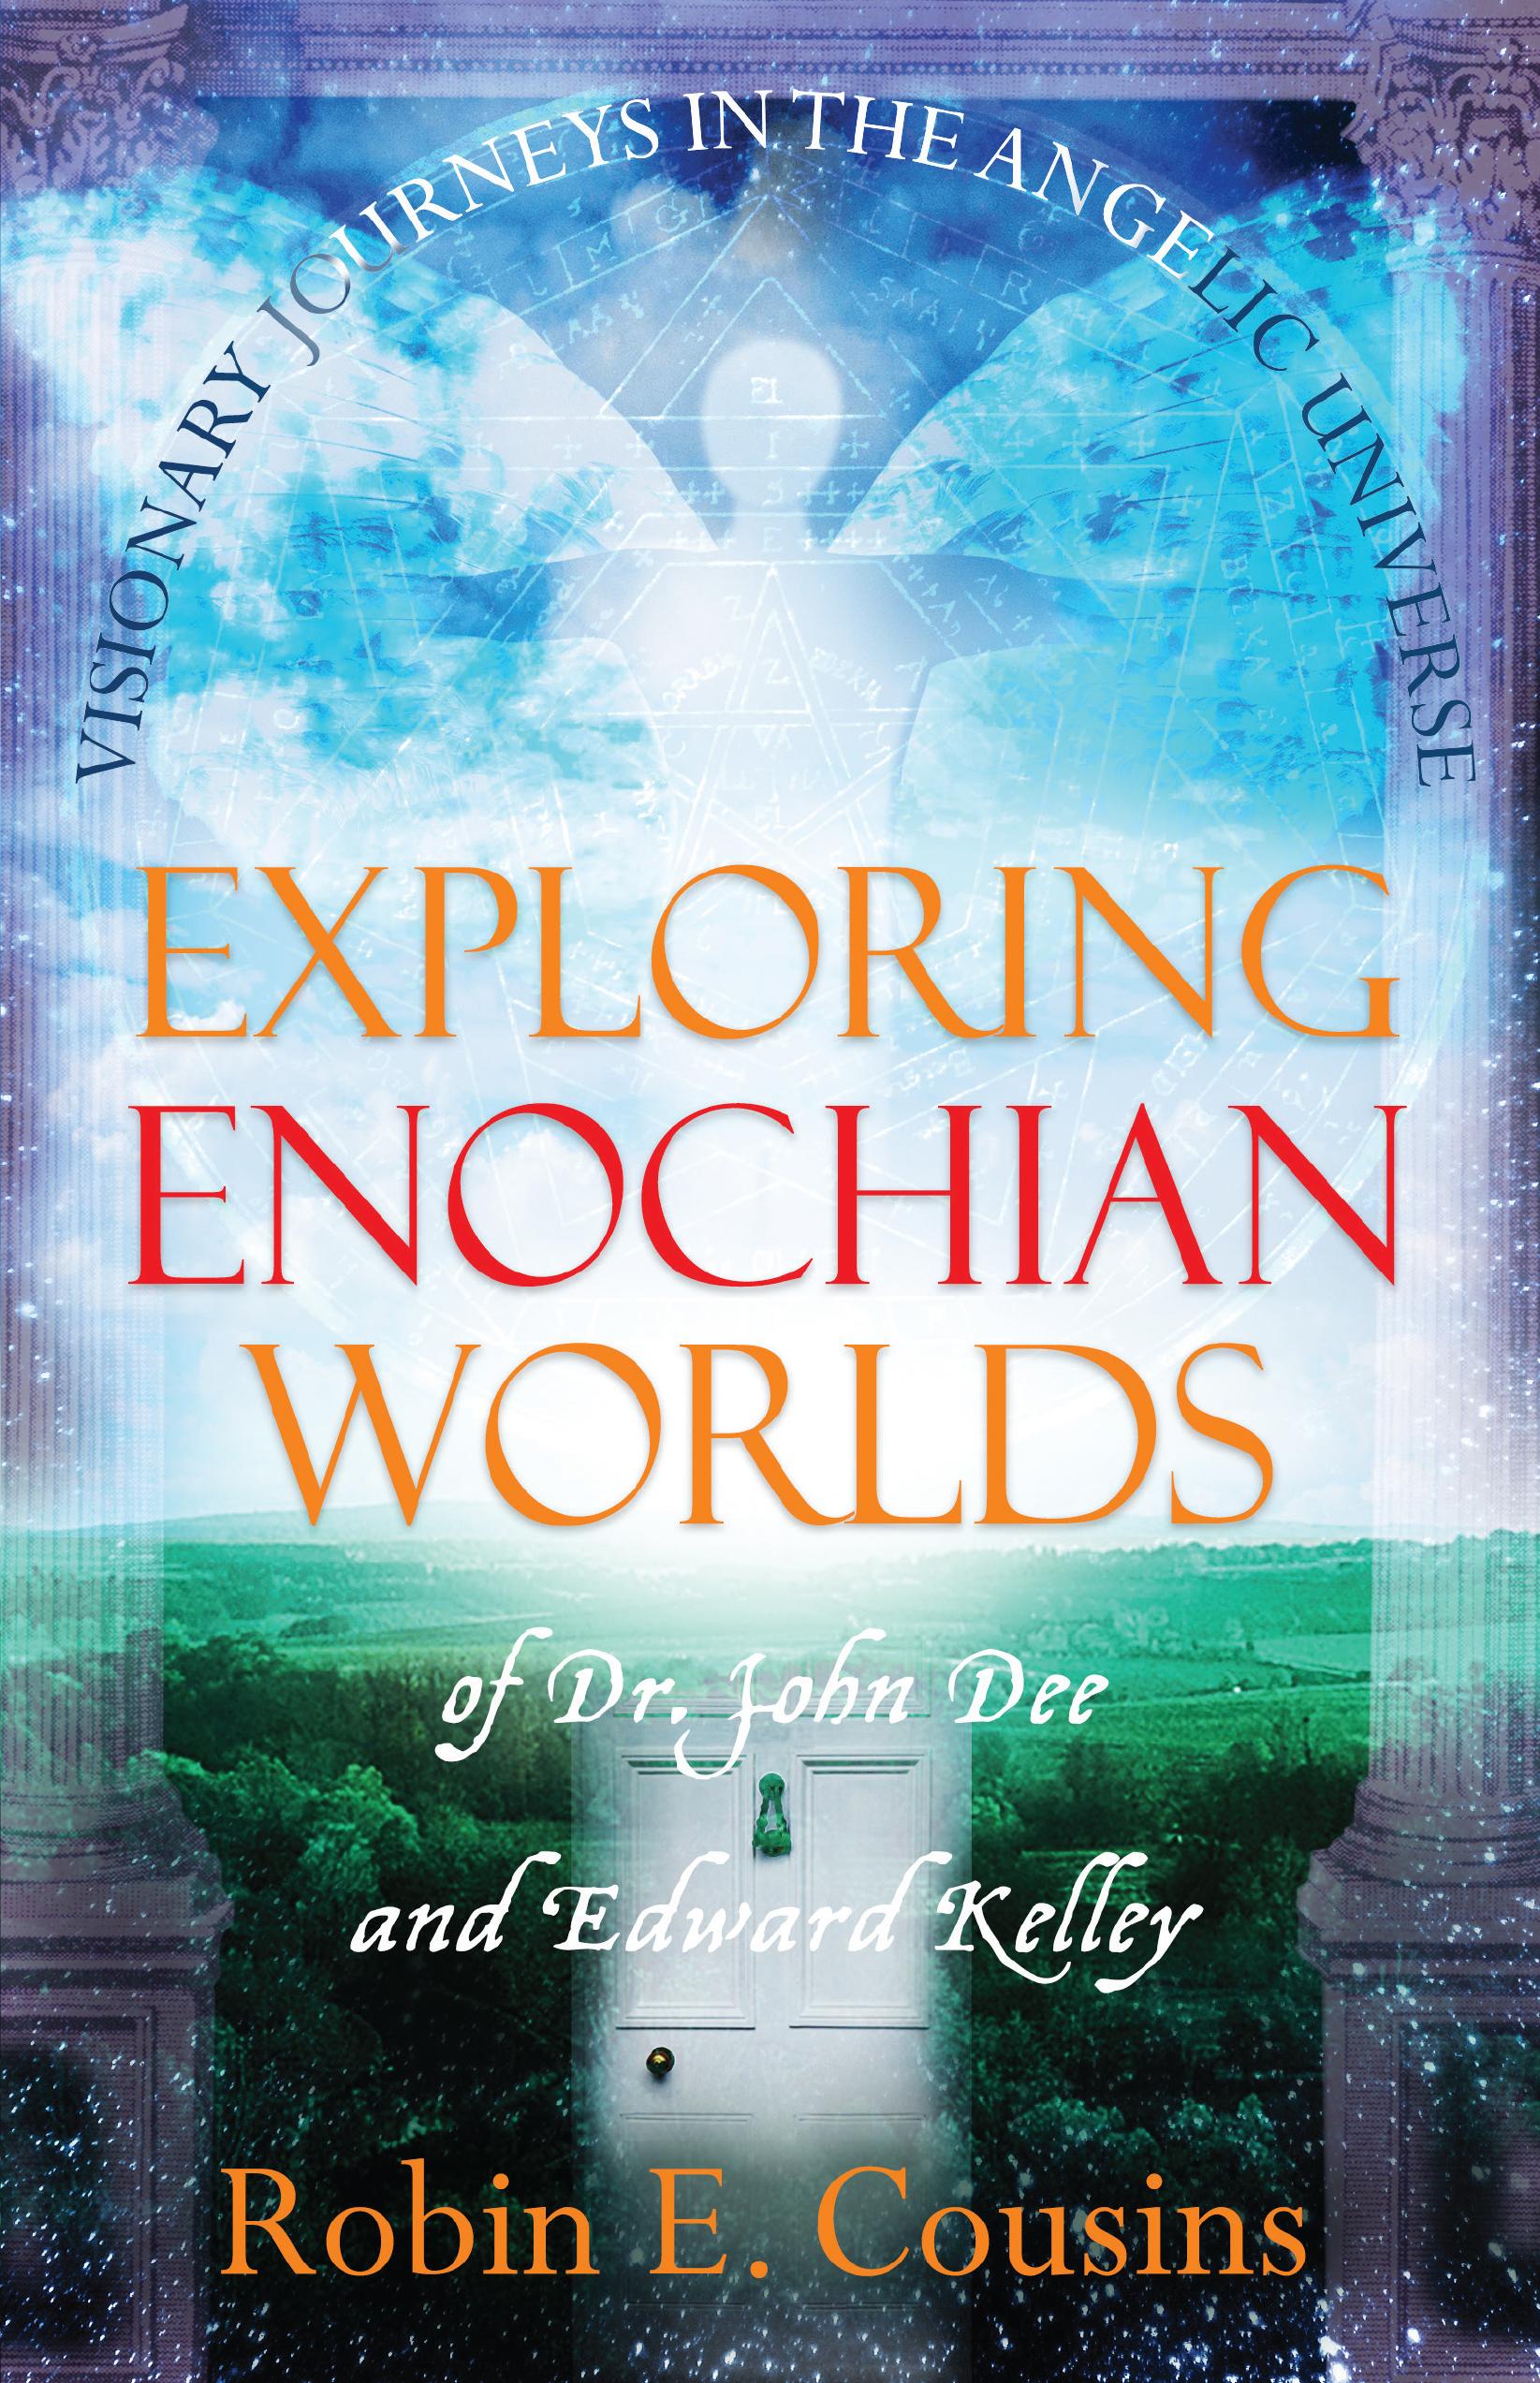 Exploring Enochian Worlds